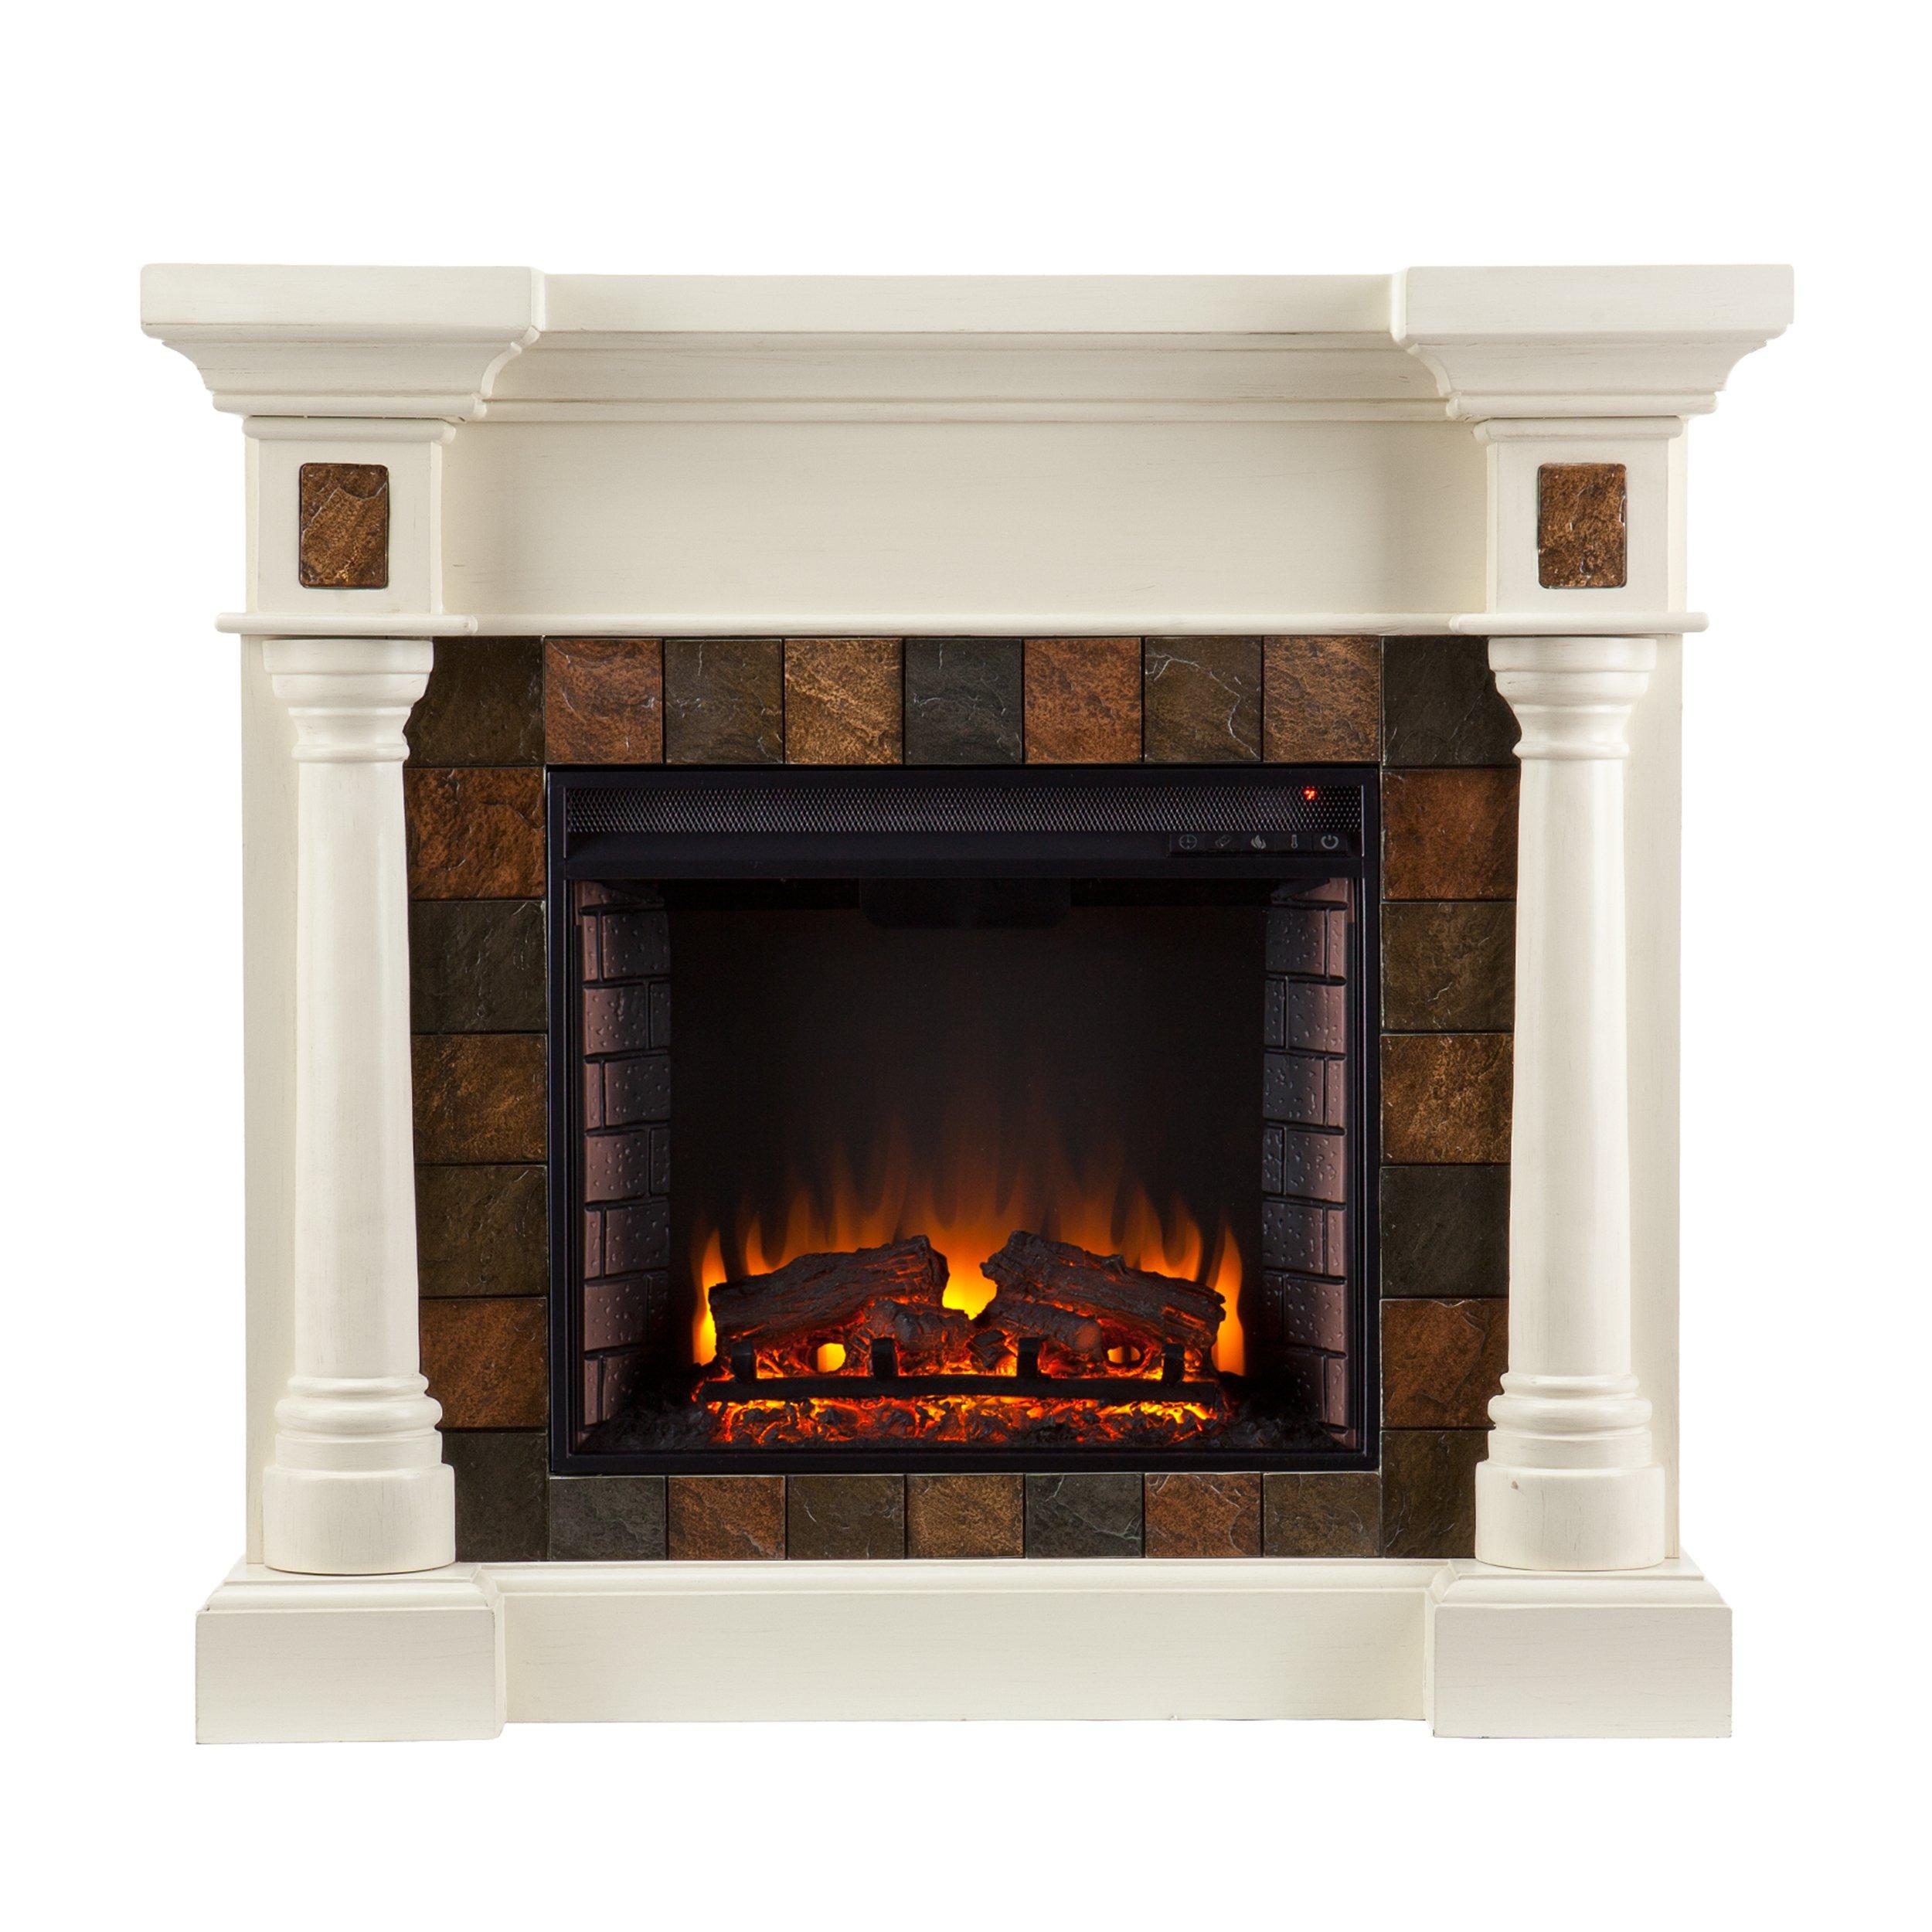 Southern Enterprises Carrington Faux Slate Convertible Electric Fireplace, Ivory Finish